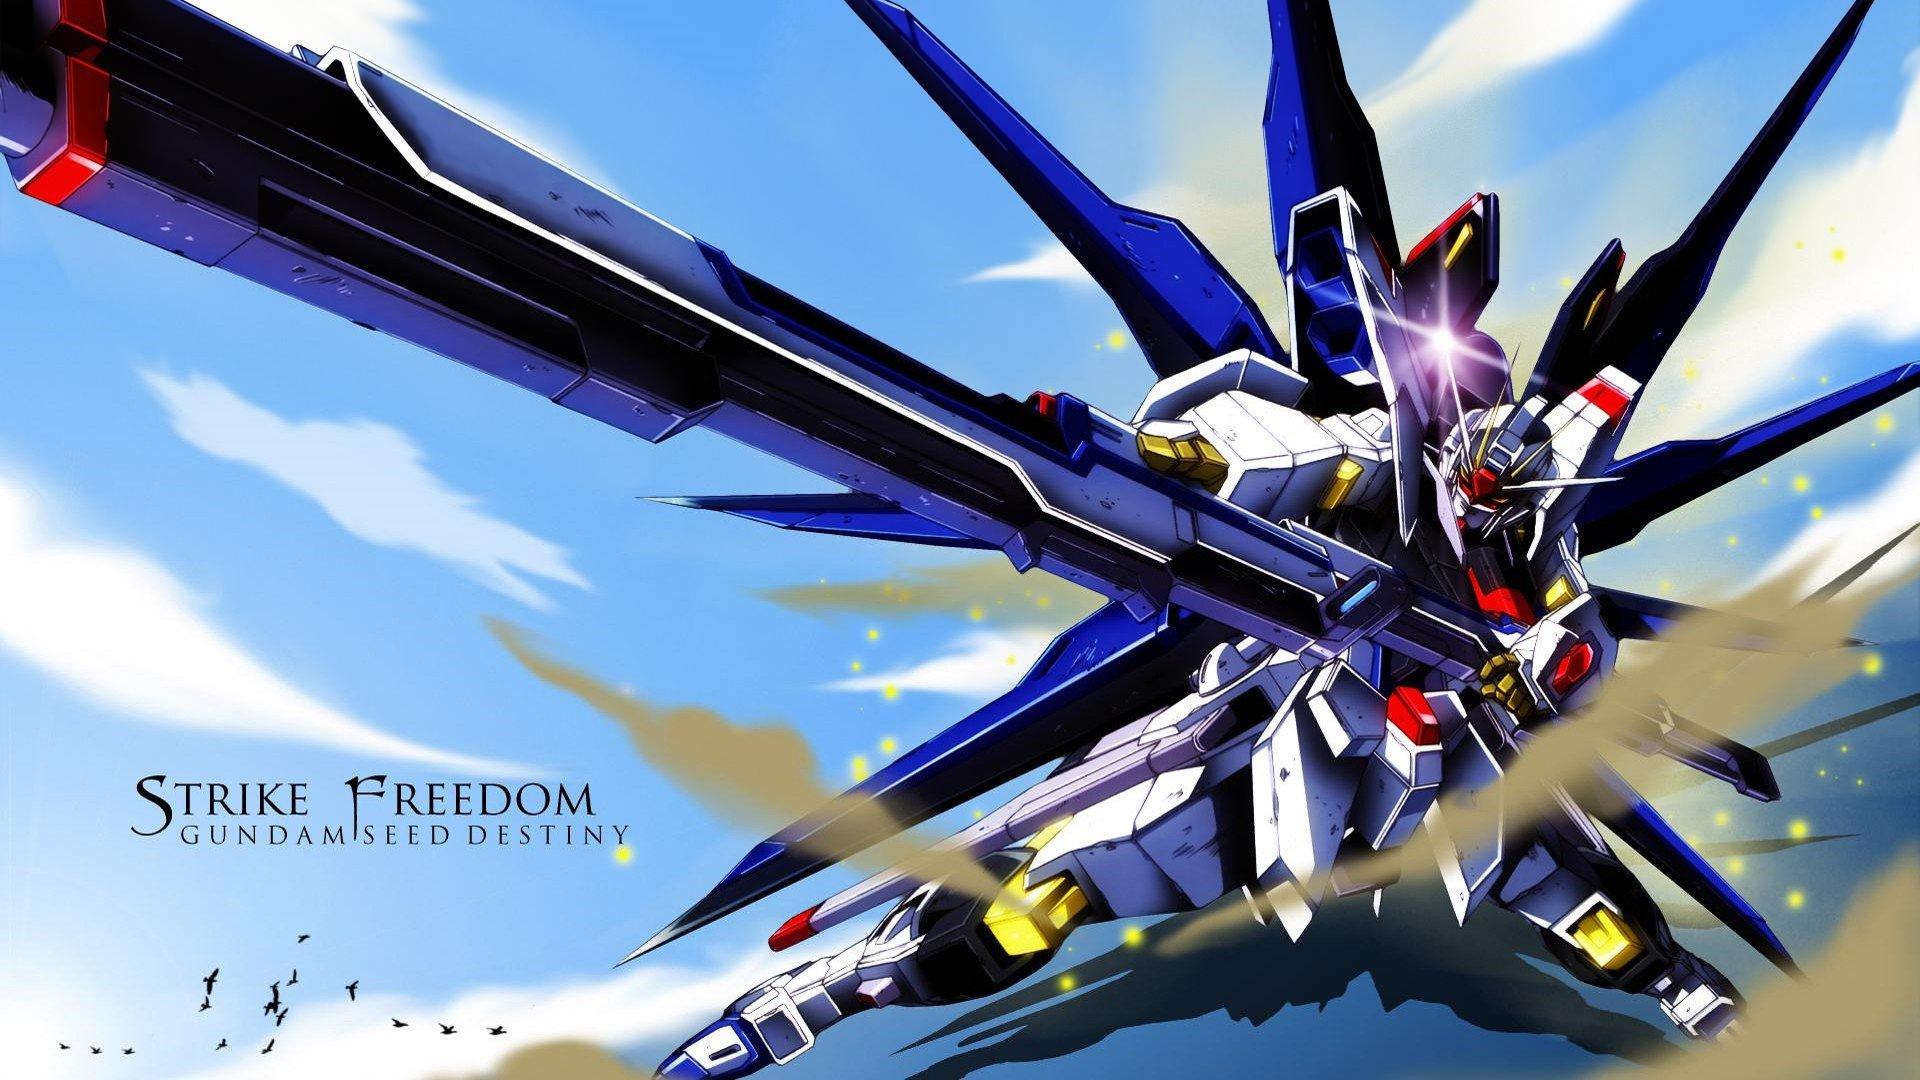 Fondos De Pantalla 1920x1080 Px Gundam Seed Destiny